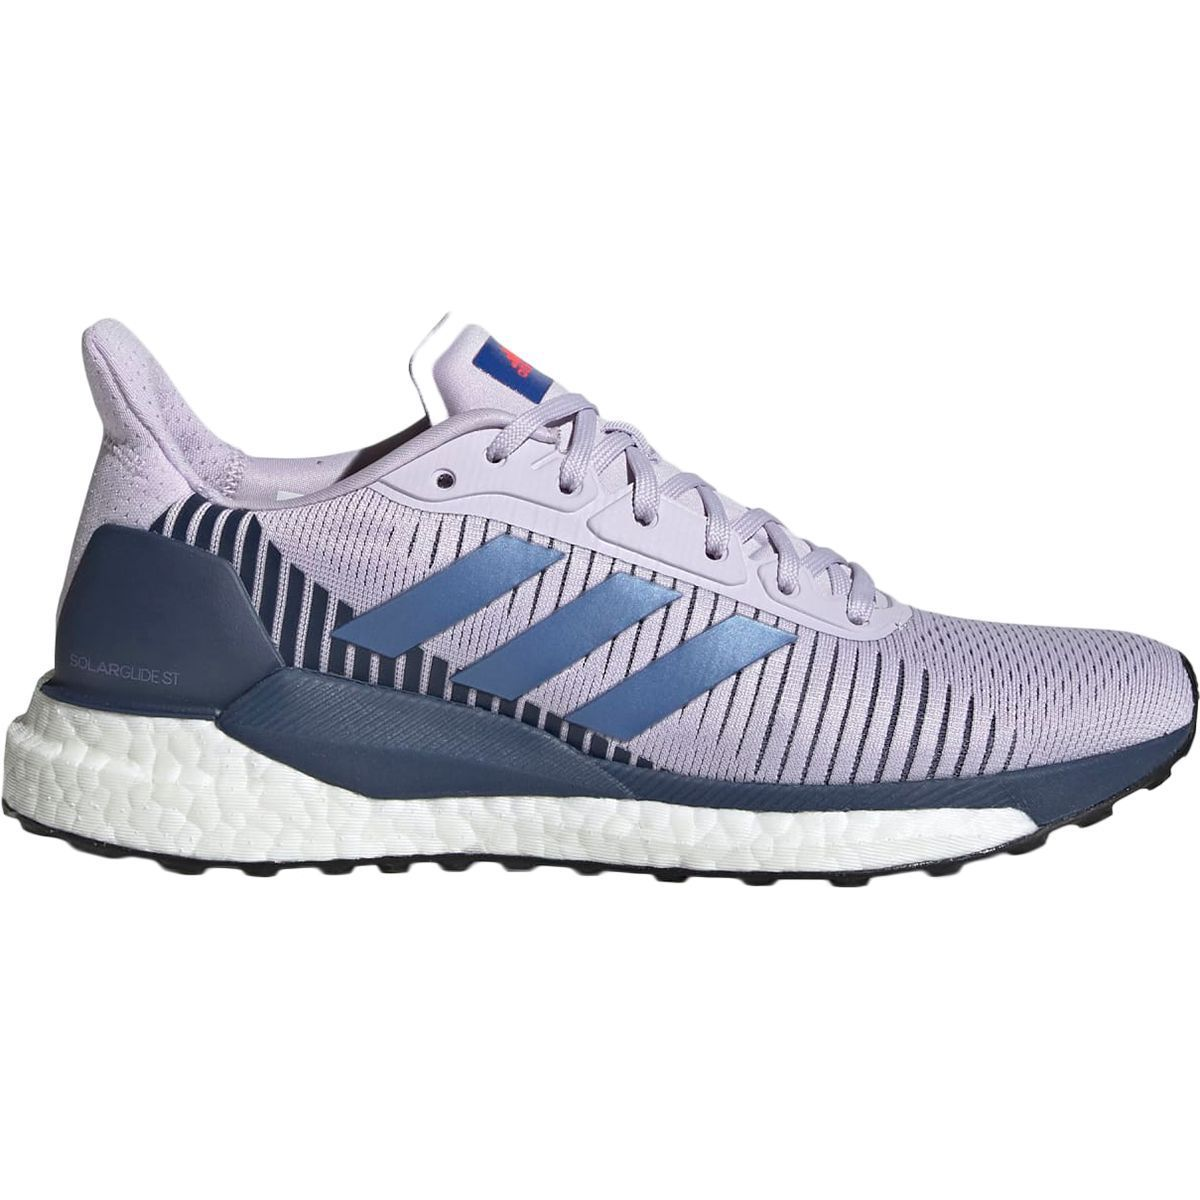 Adidas Solar Glide ST Boost Running Shoe - Women's#adidas ...